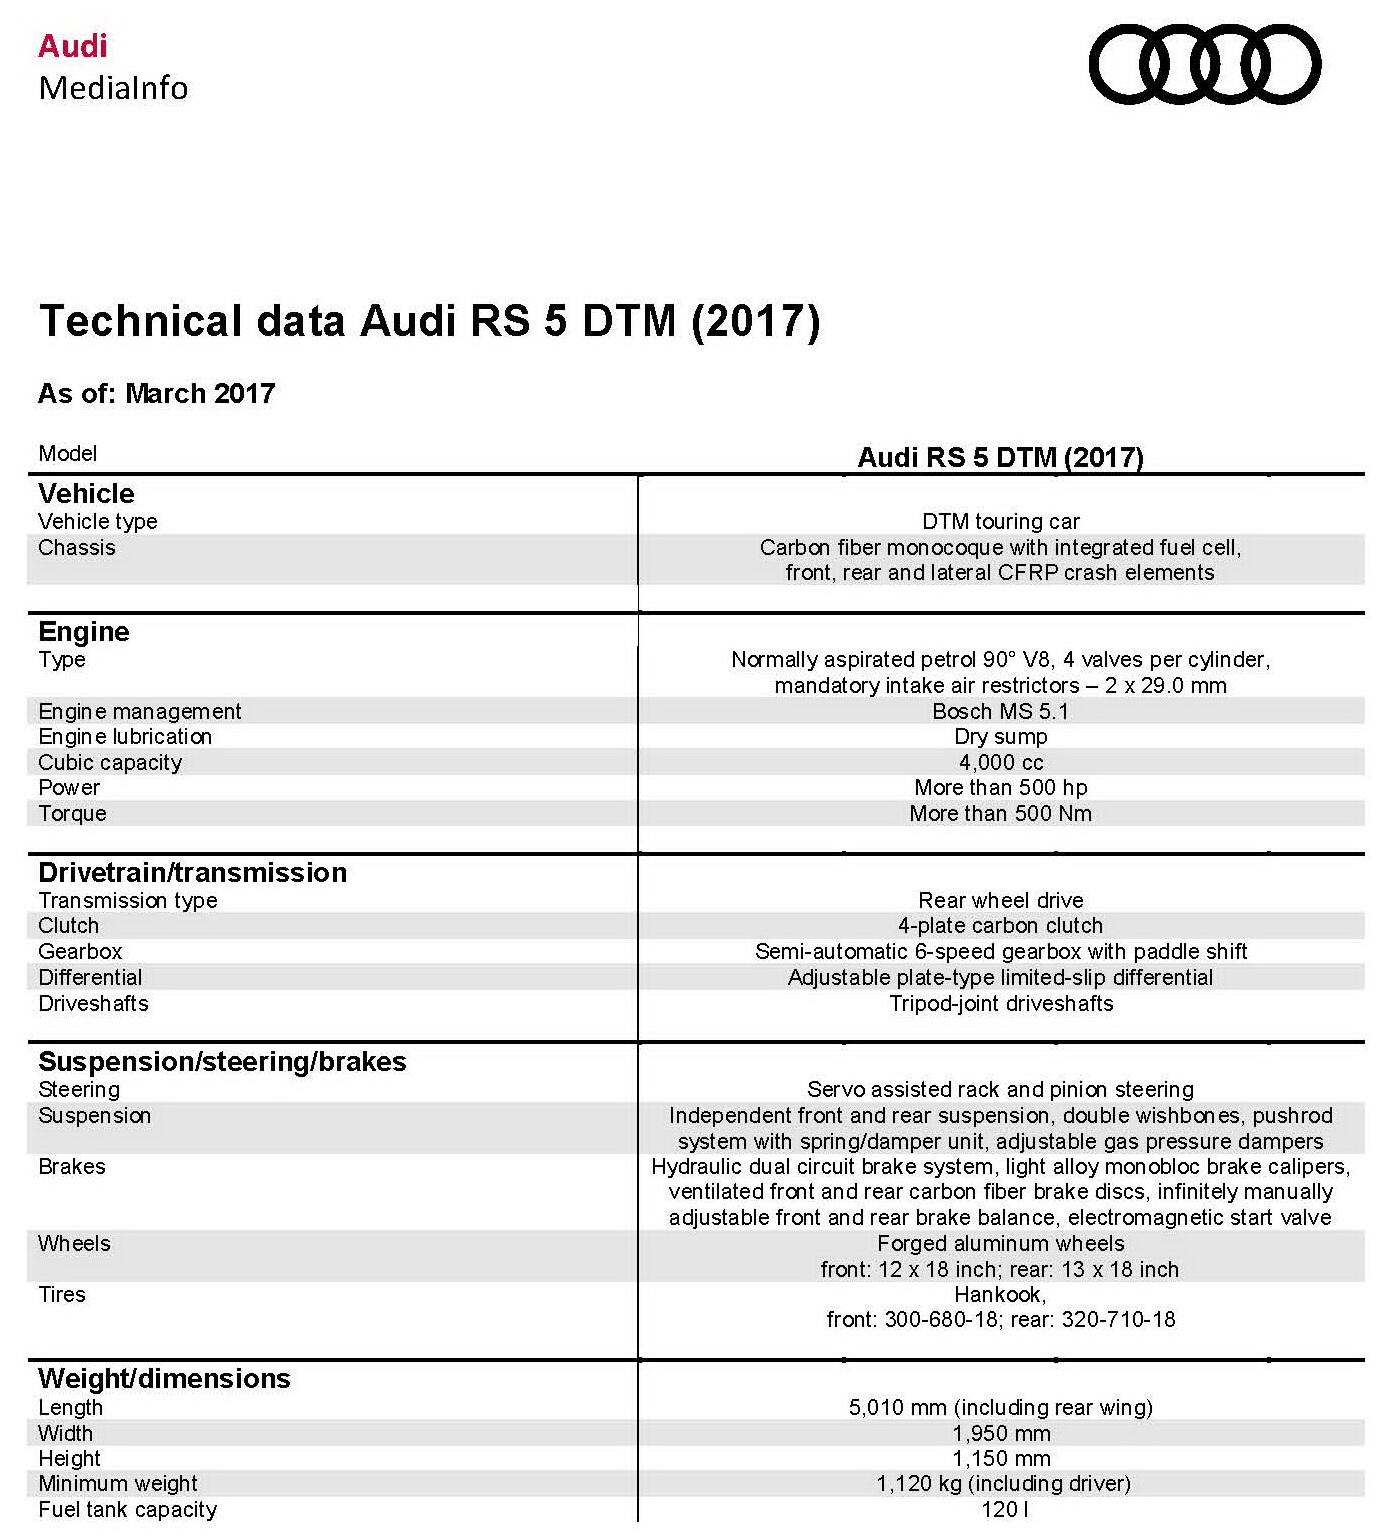 2017 Audi RS 5 DTM technical data